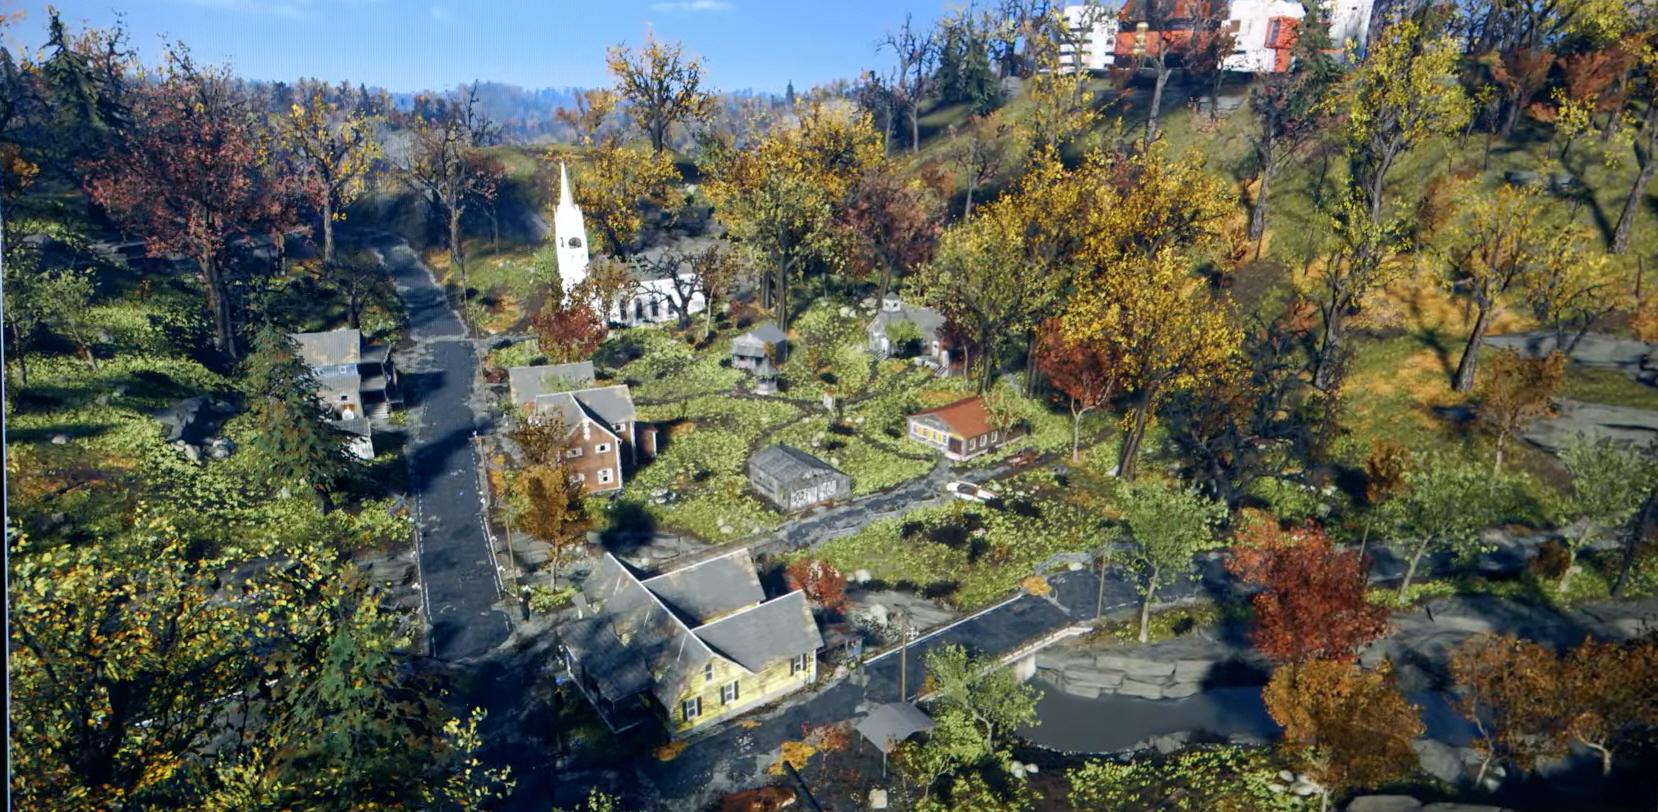 Helvetia Fallout Wiki Fandom Powered By Wikia